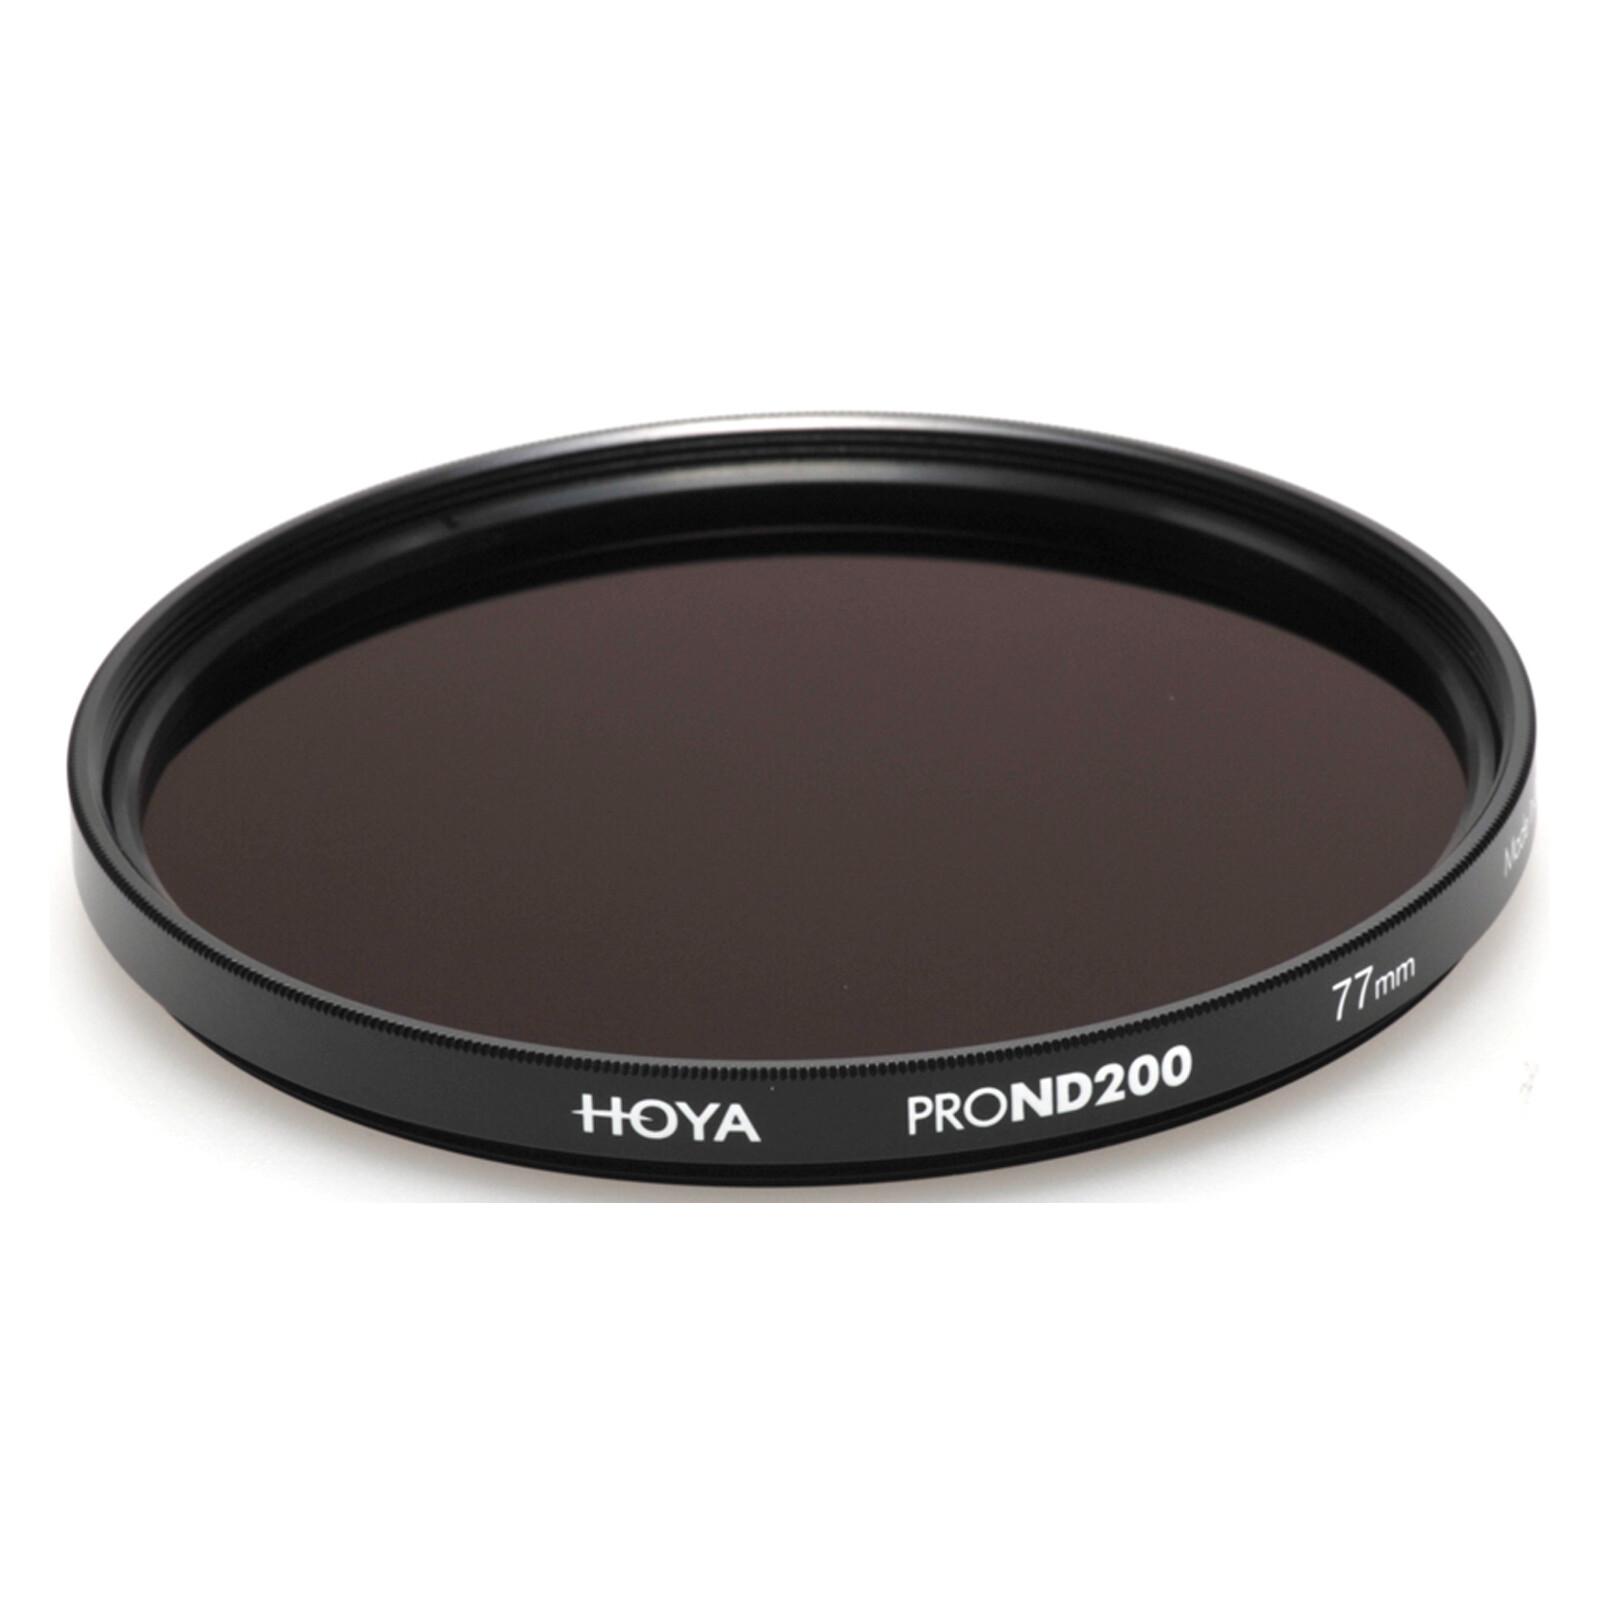 Hoya Grau PRO ND 200 67mm